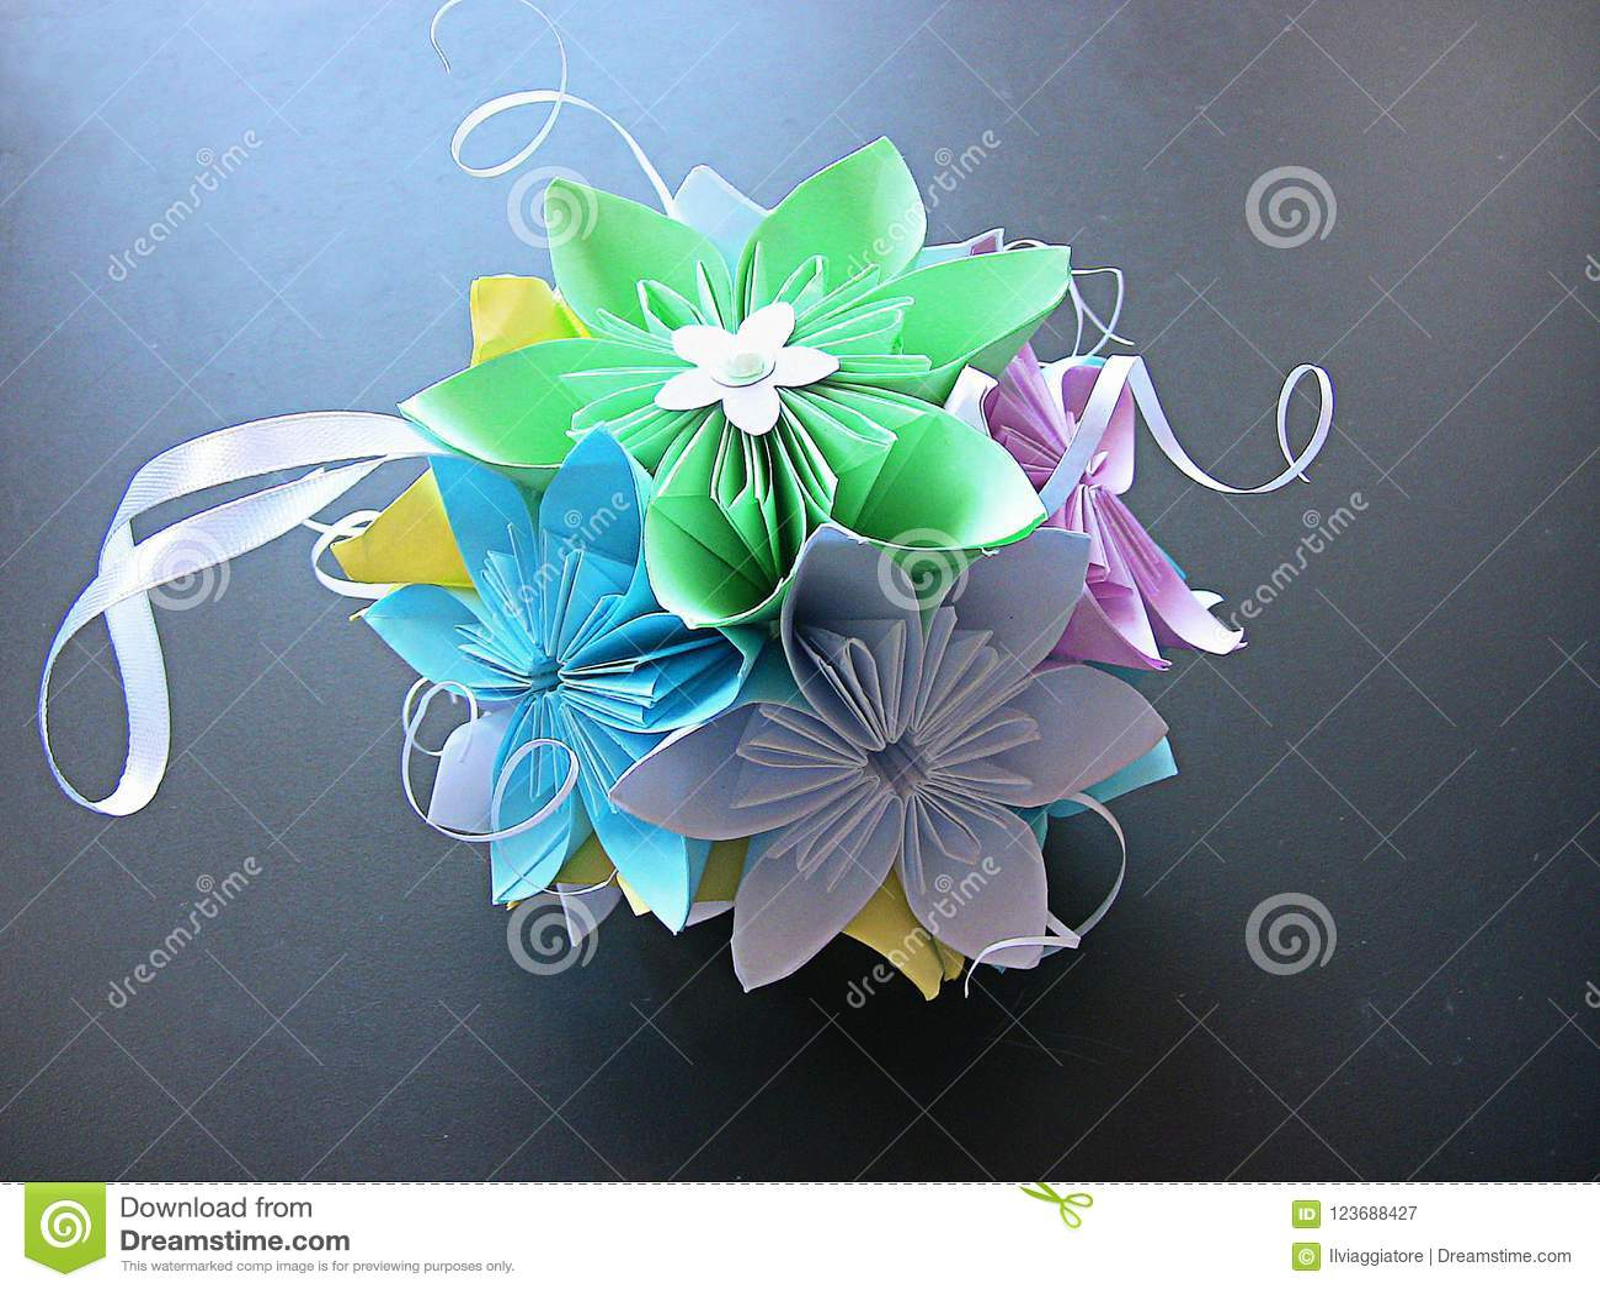 Italian handicraft with paper flowers 2 editorial photography download italian handicraft with paper flowers 2 editorial photography image of decor image mightylinksfo